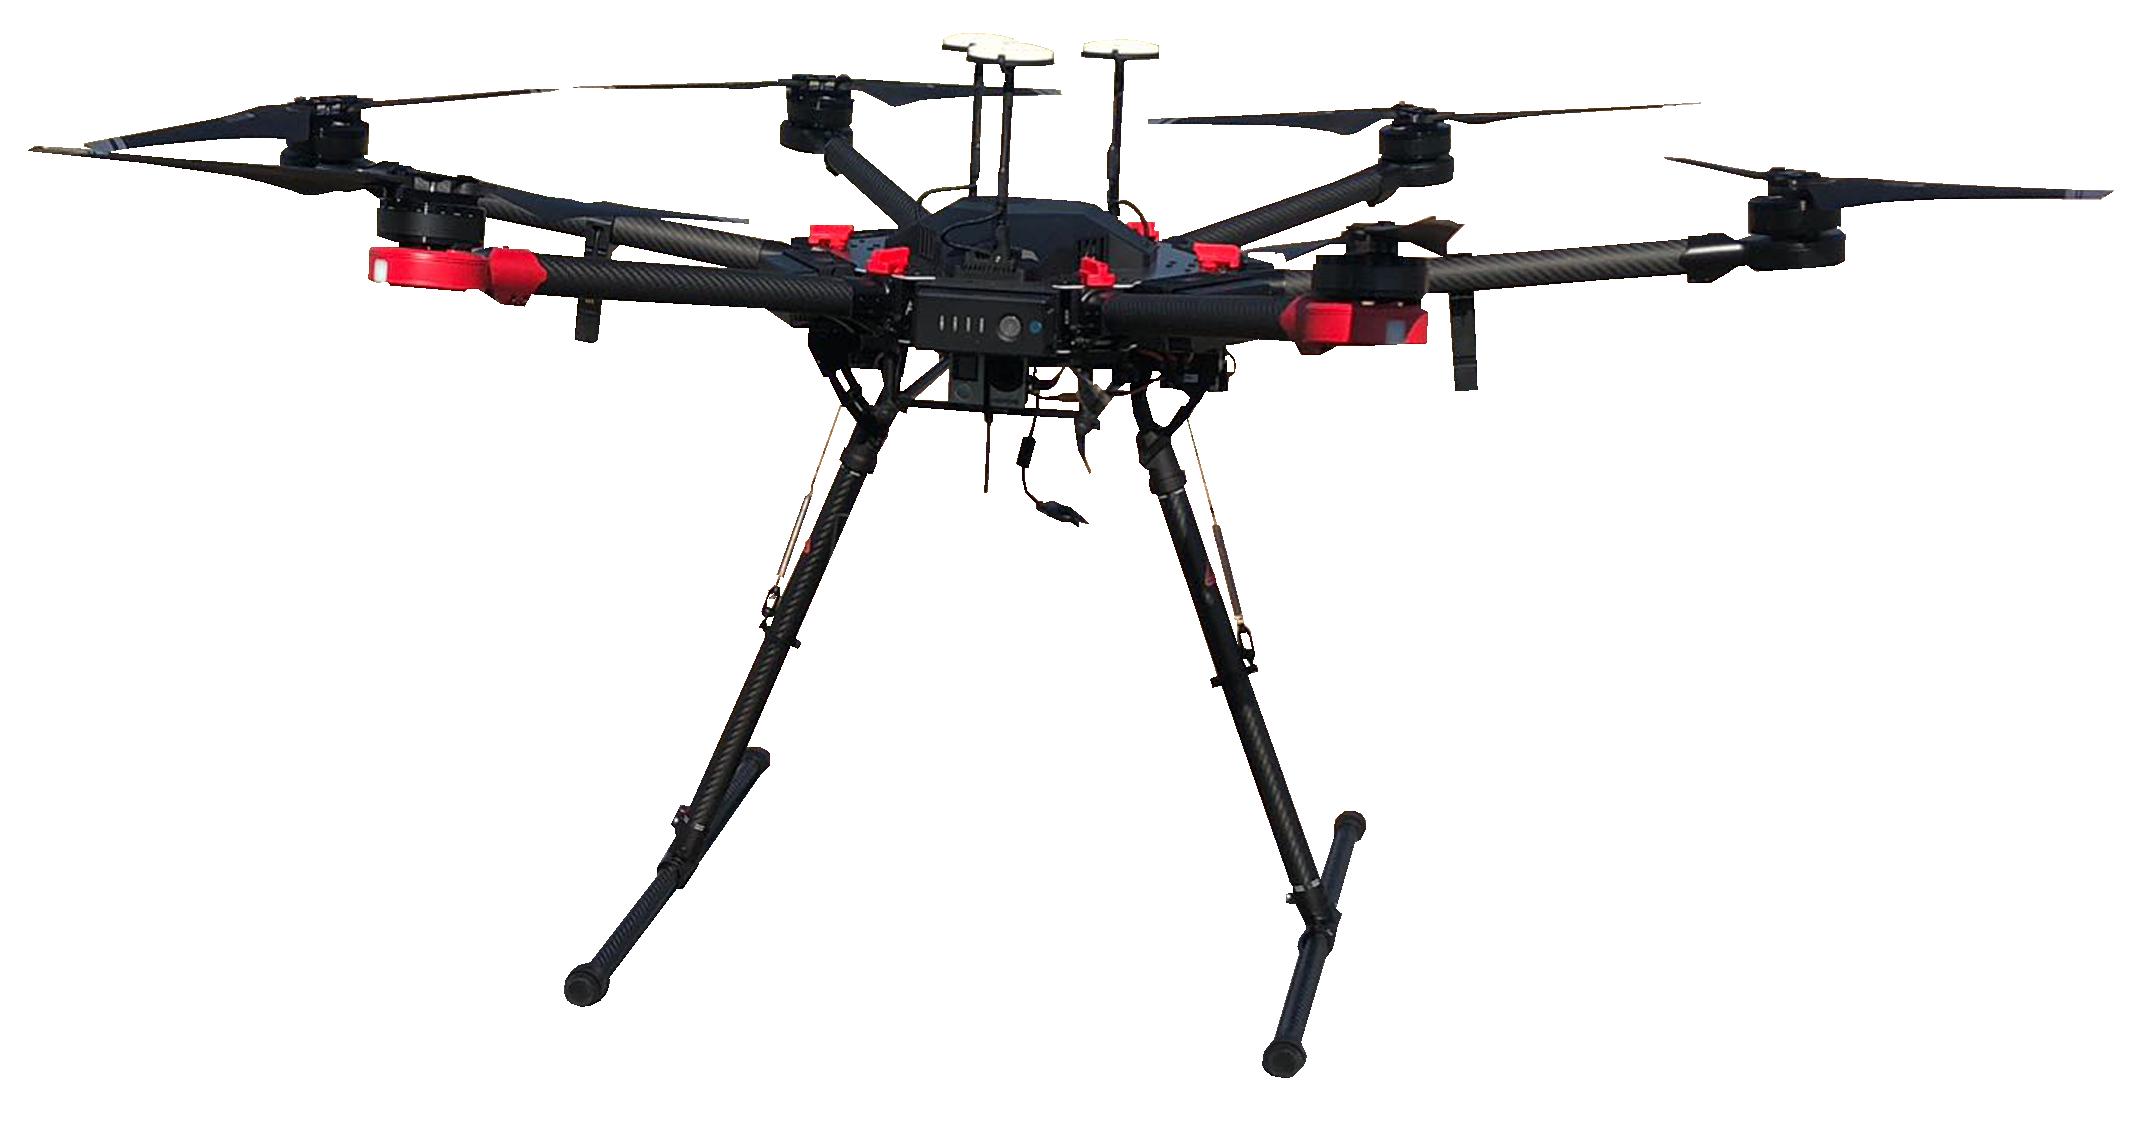 ACG Drone - Matrice 600 Pro